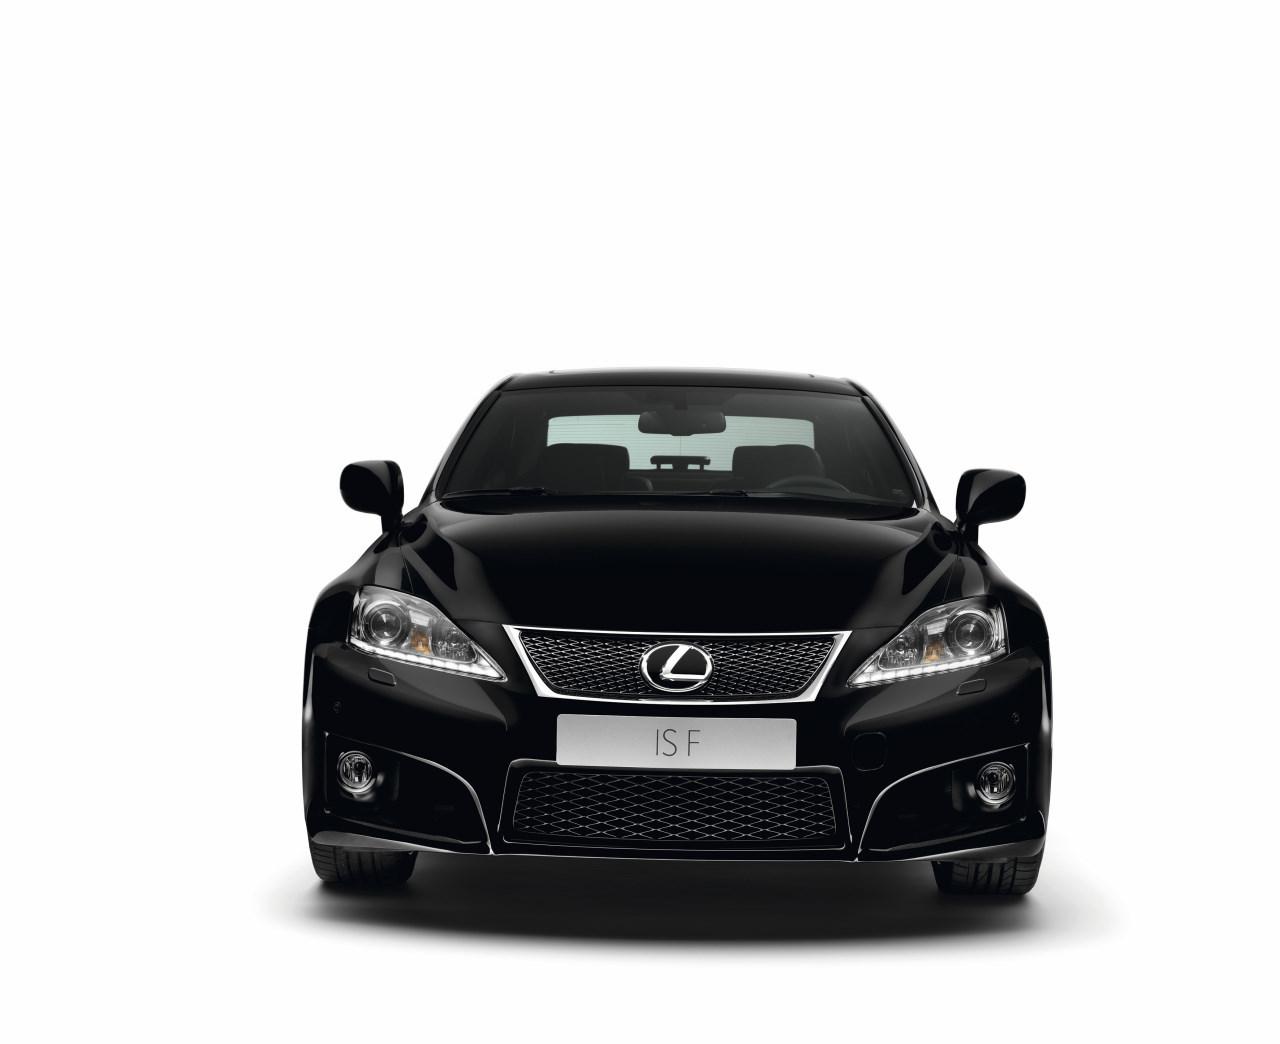 Foto de Lexus IS-F 2011 (9/13)